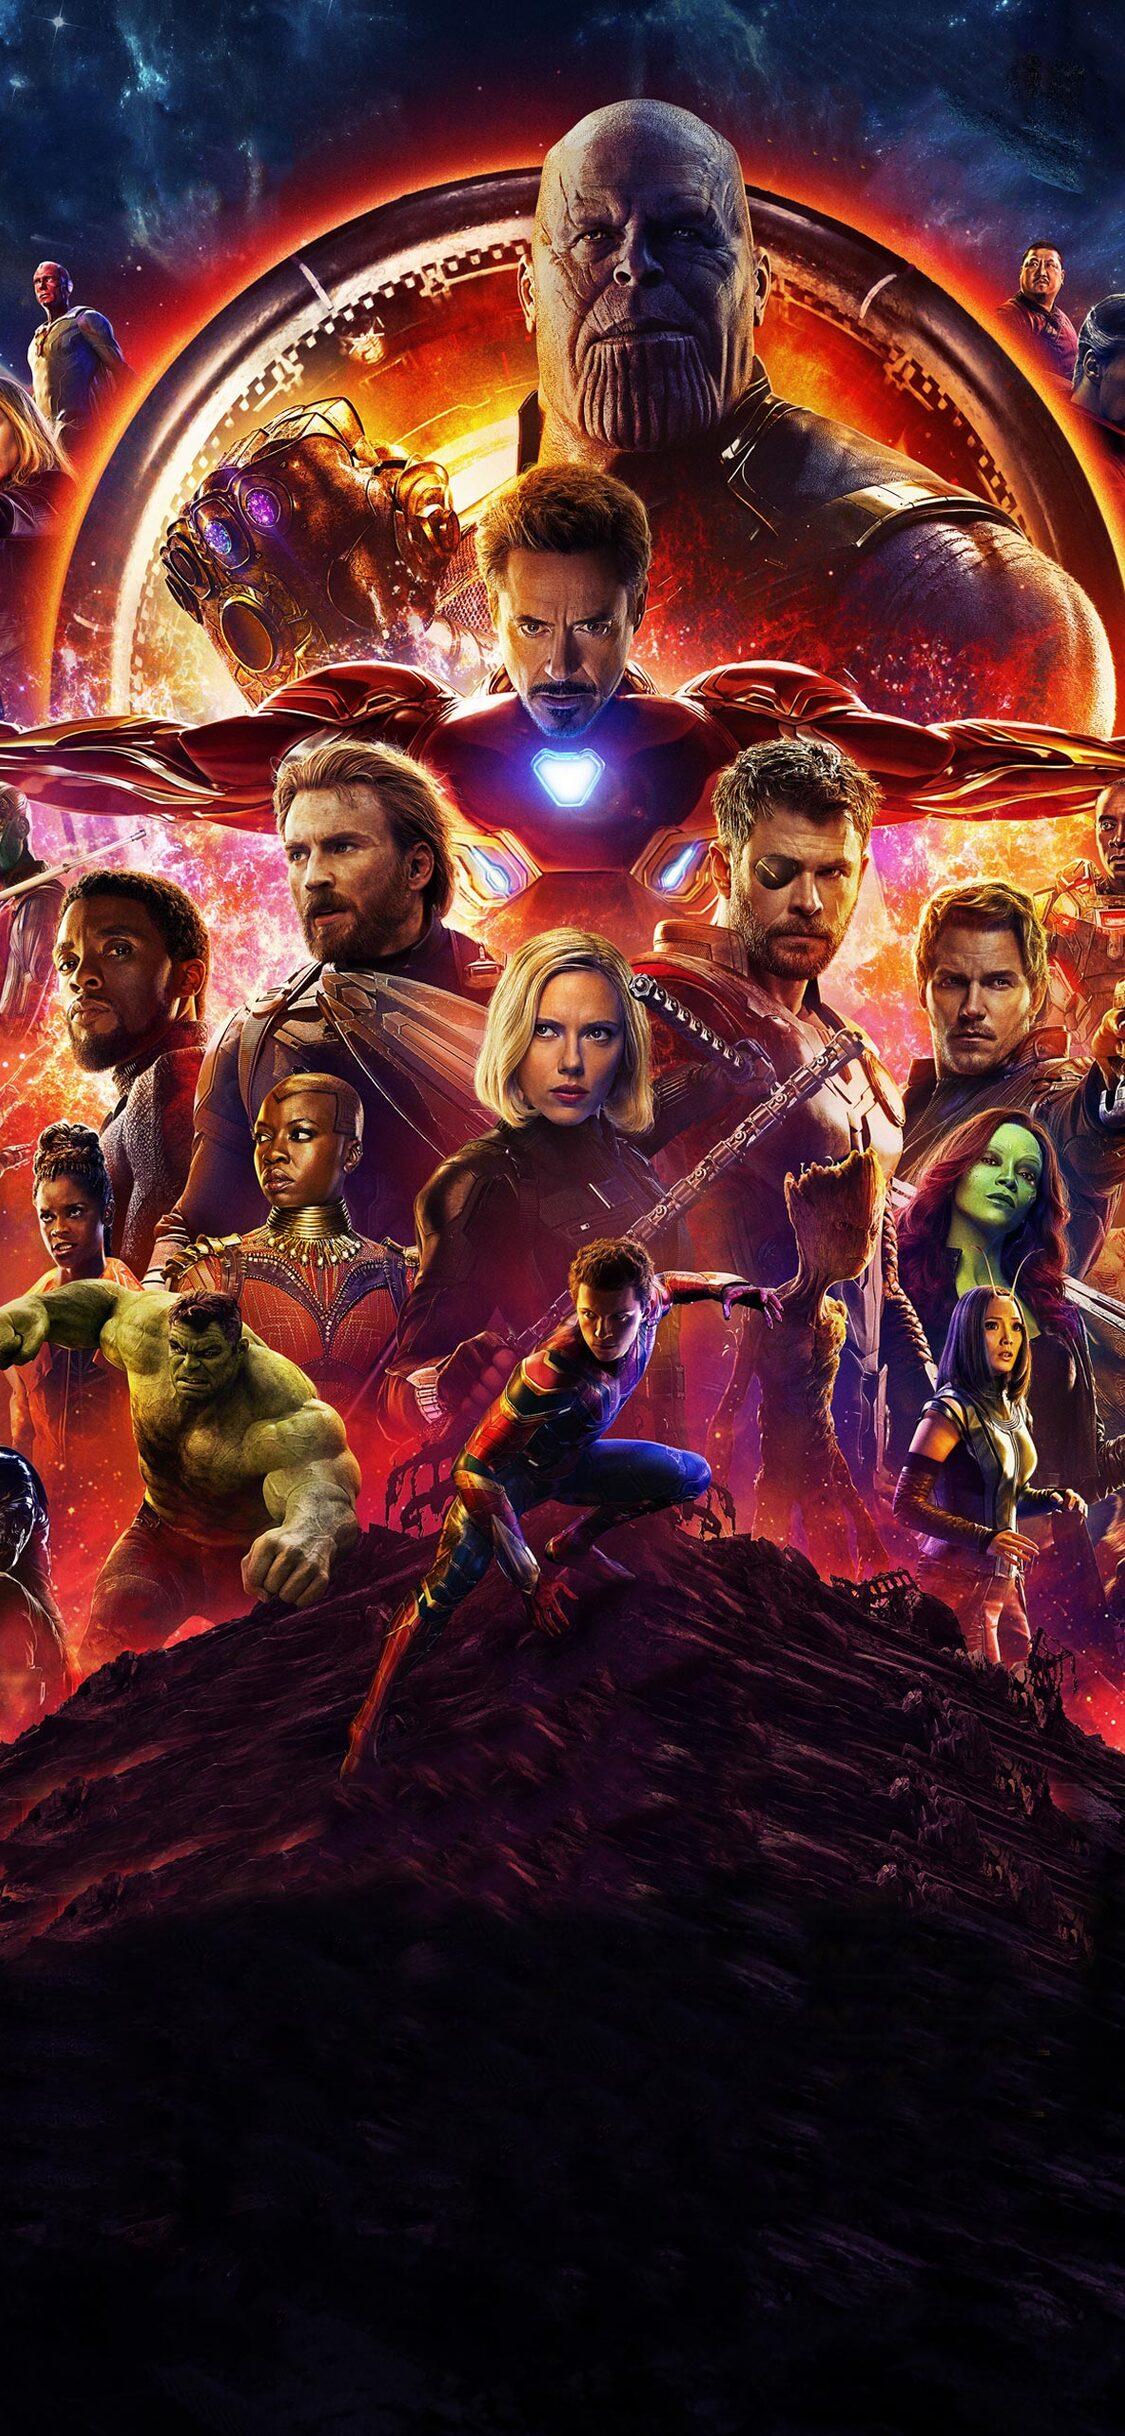 1125x2436 avengers infinity war 2018 poster 4k iphone xs - Avengers infinity war wallpaper iphone ...